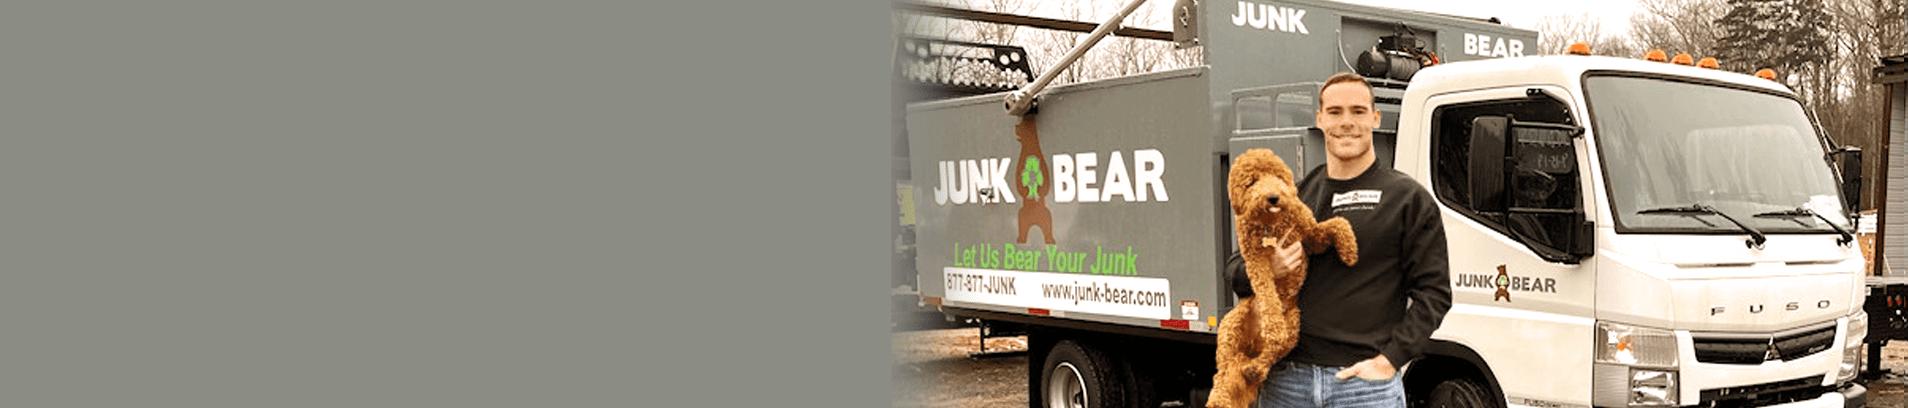 Junk Bear expert with dog